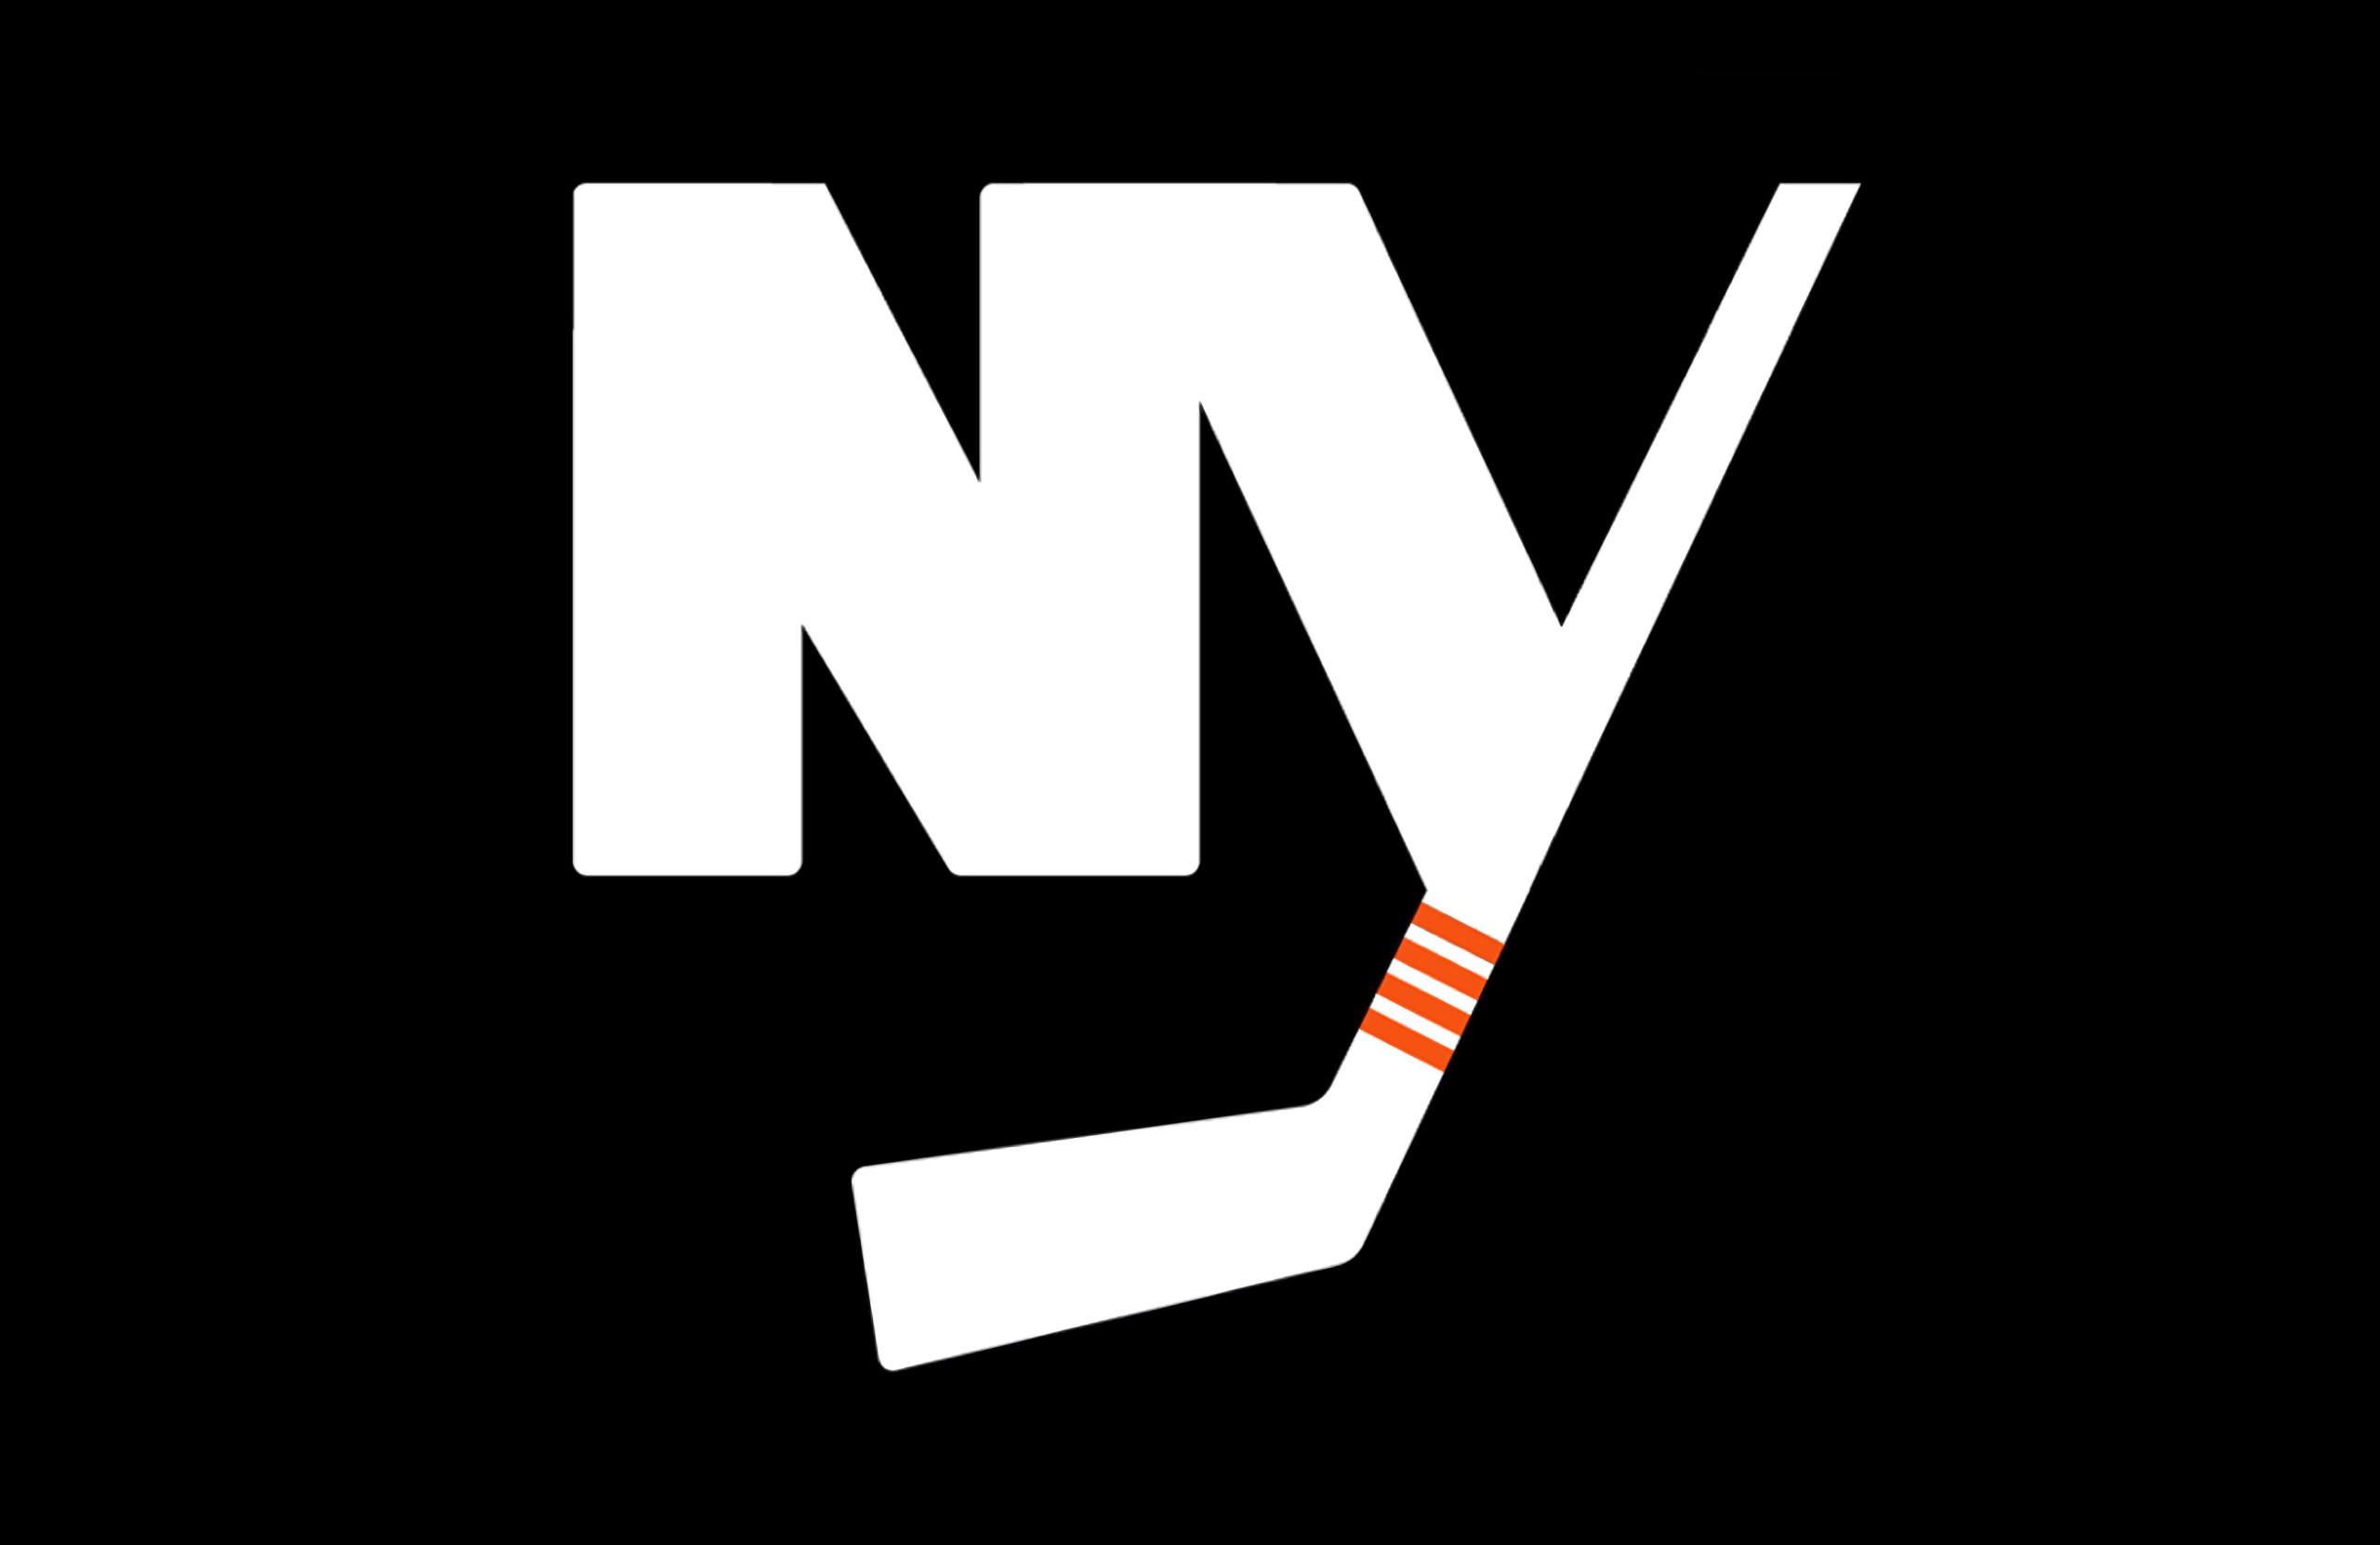 New York Mets Wallpaper Hd New York Islanders Wallpaper 183 ① Wallpapertag